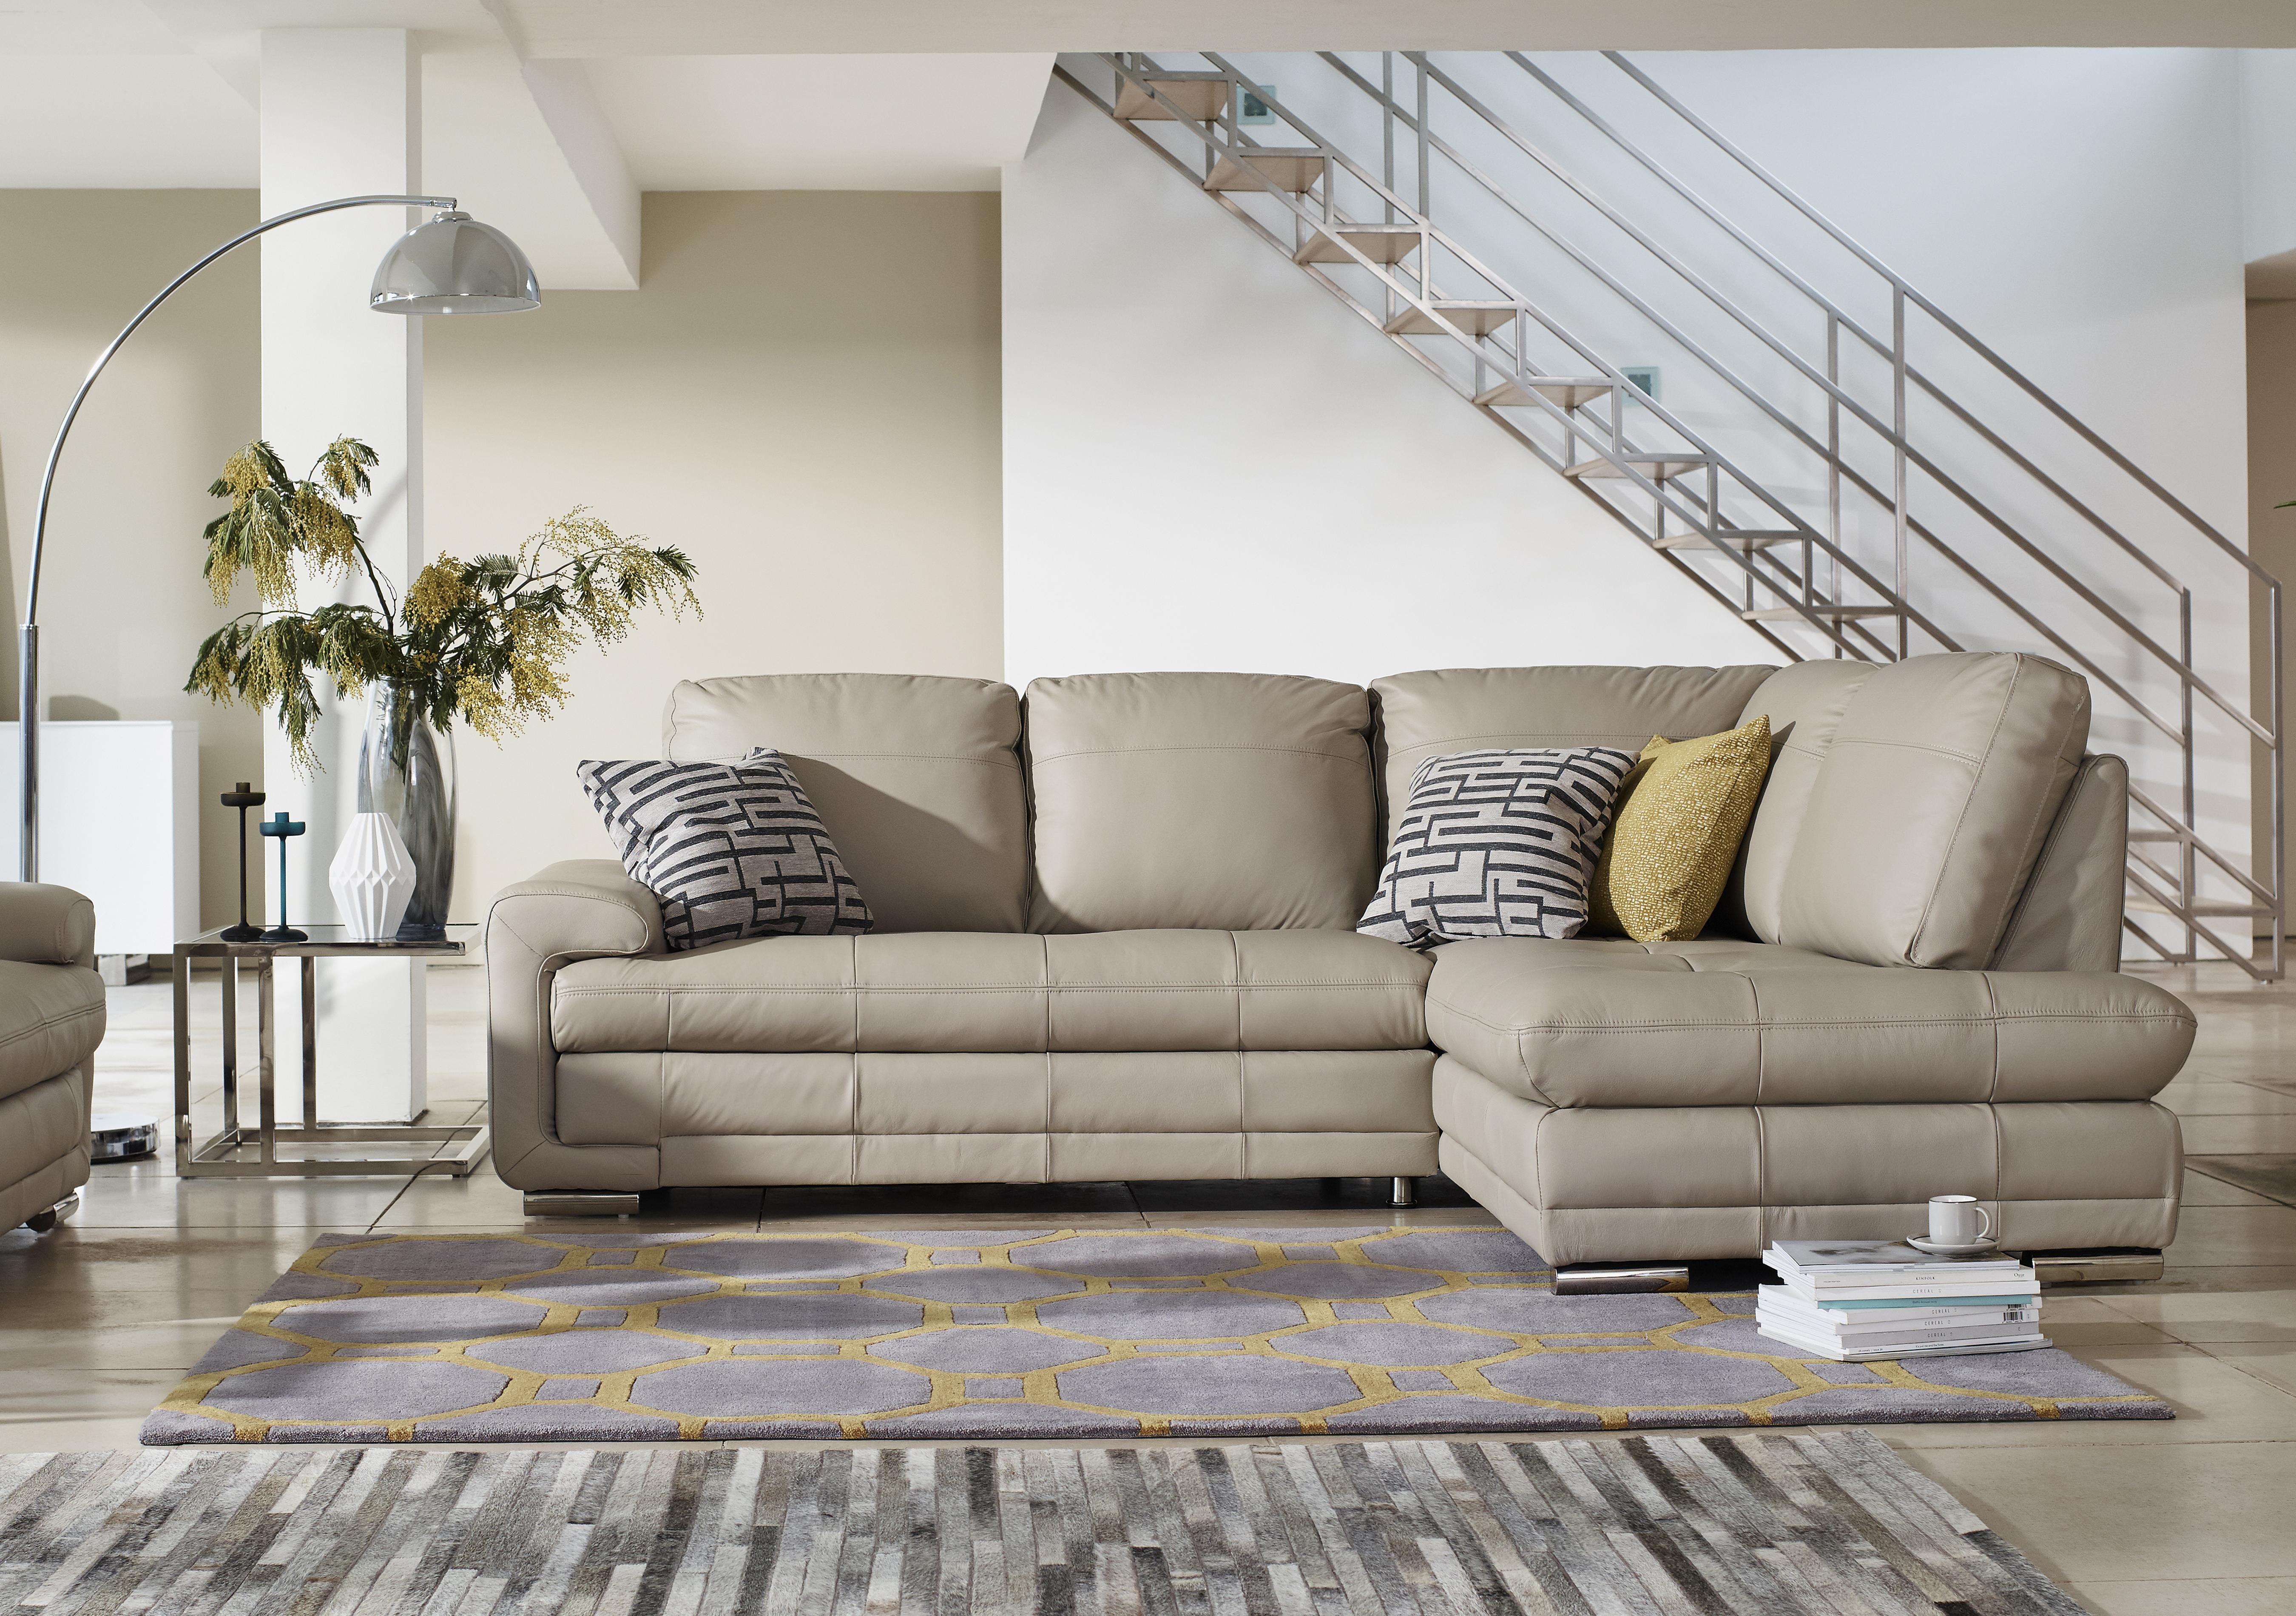 2x2 meter good 2x2 meter with 2x2 meter 2x2 meter with 2x2 meter gallery of hot sale x meter. Black Bedroom Furniture Sets. Home Design Ideas